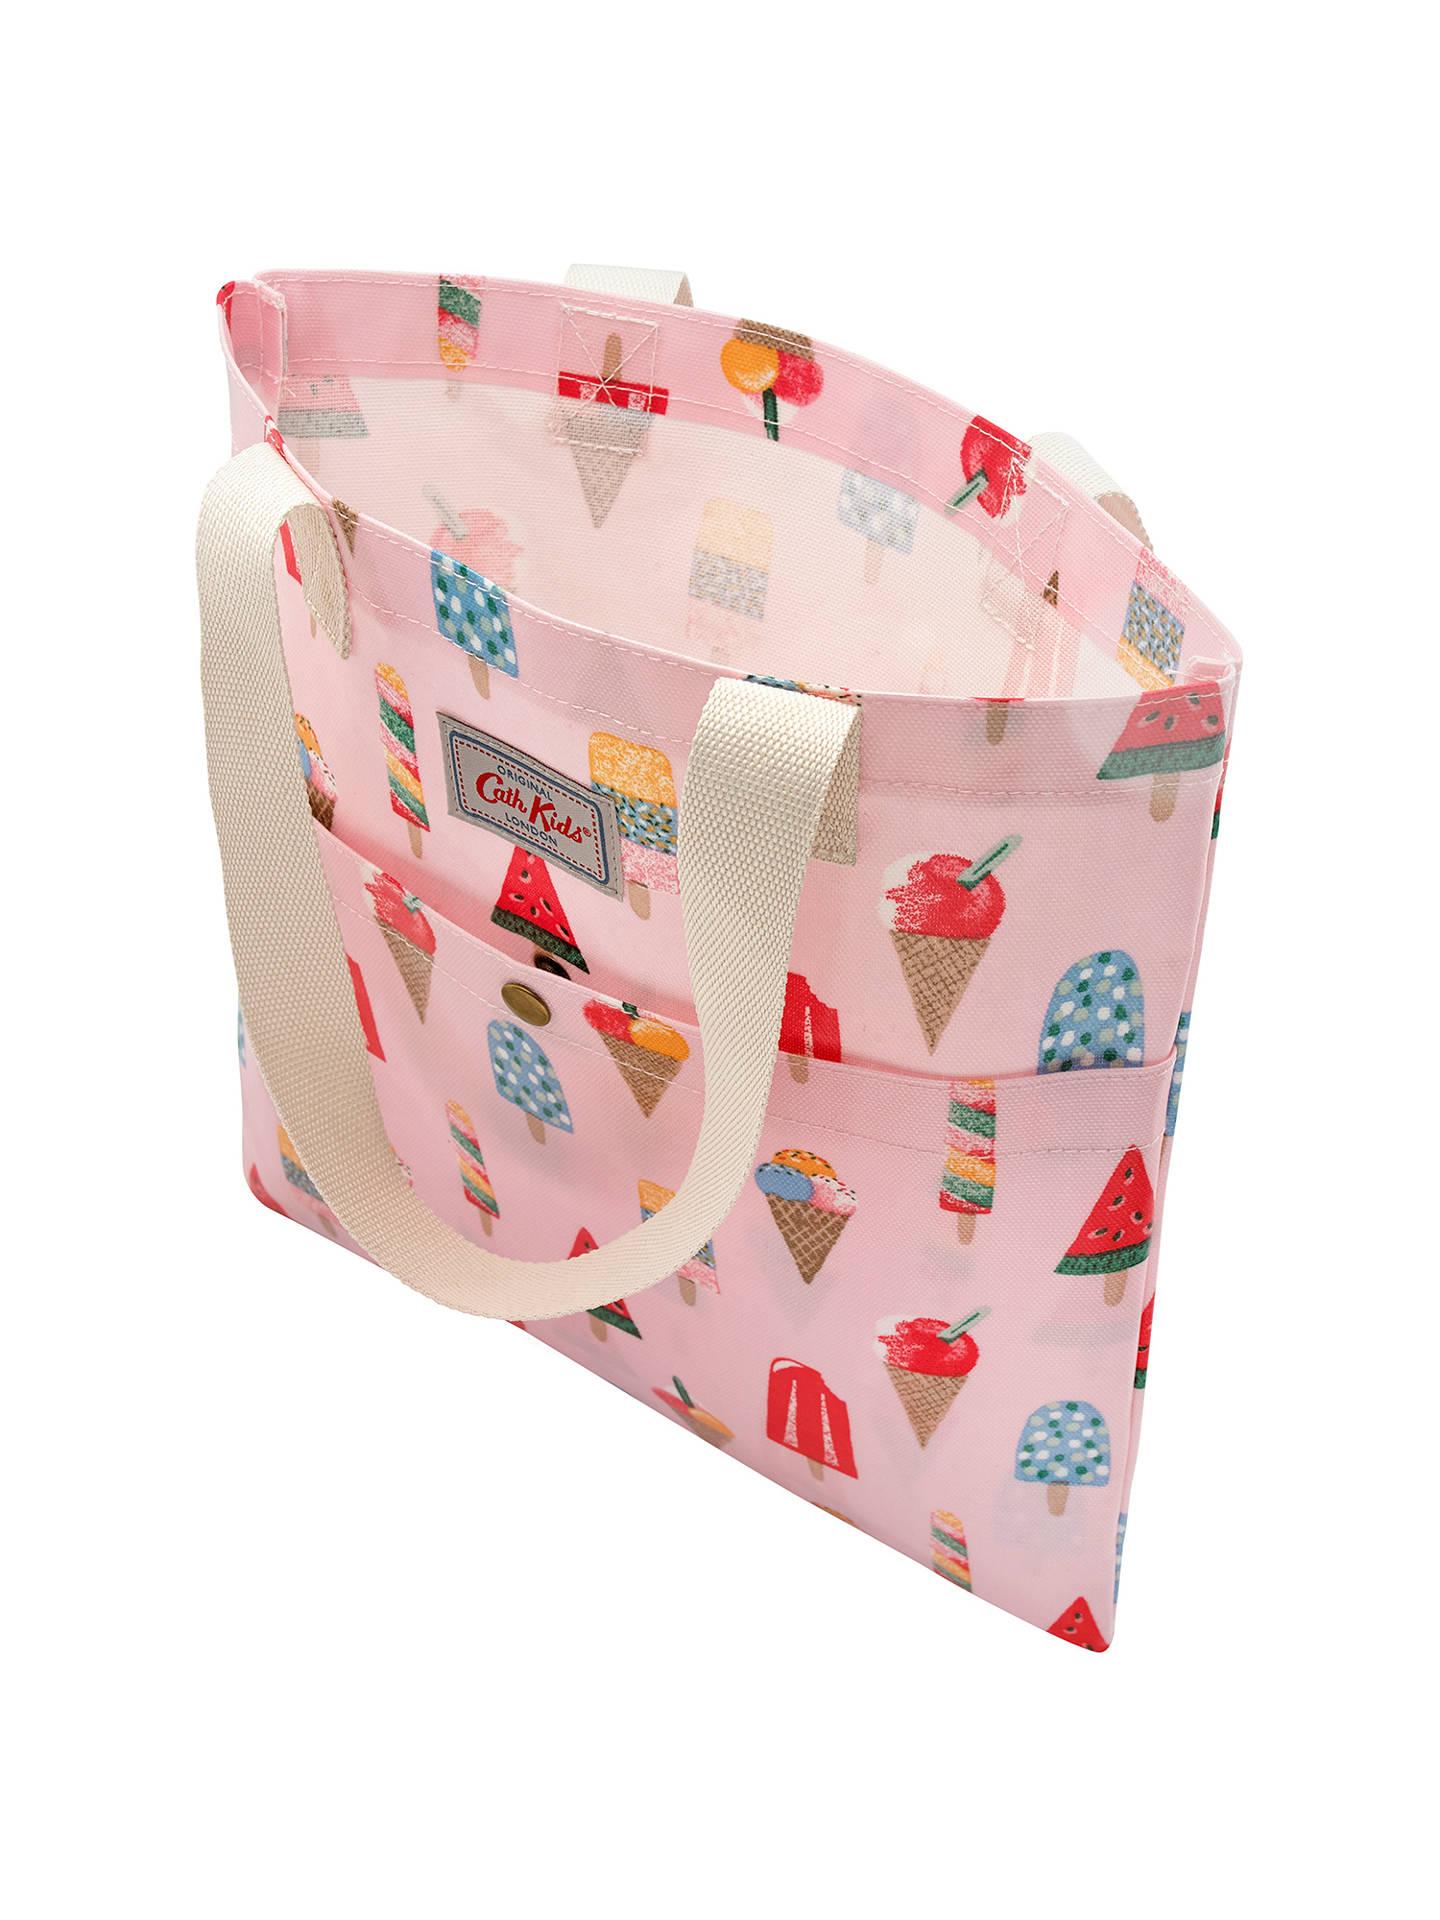 ... BuyCath Kidston Children s Little Ice Cream Book Bag 0bf1fca8b9804